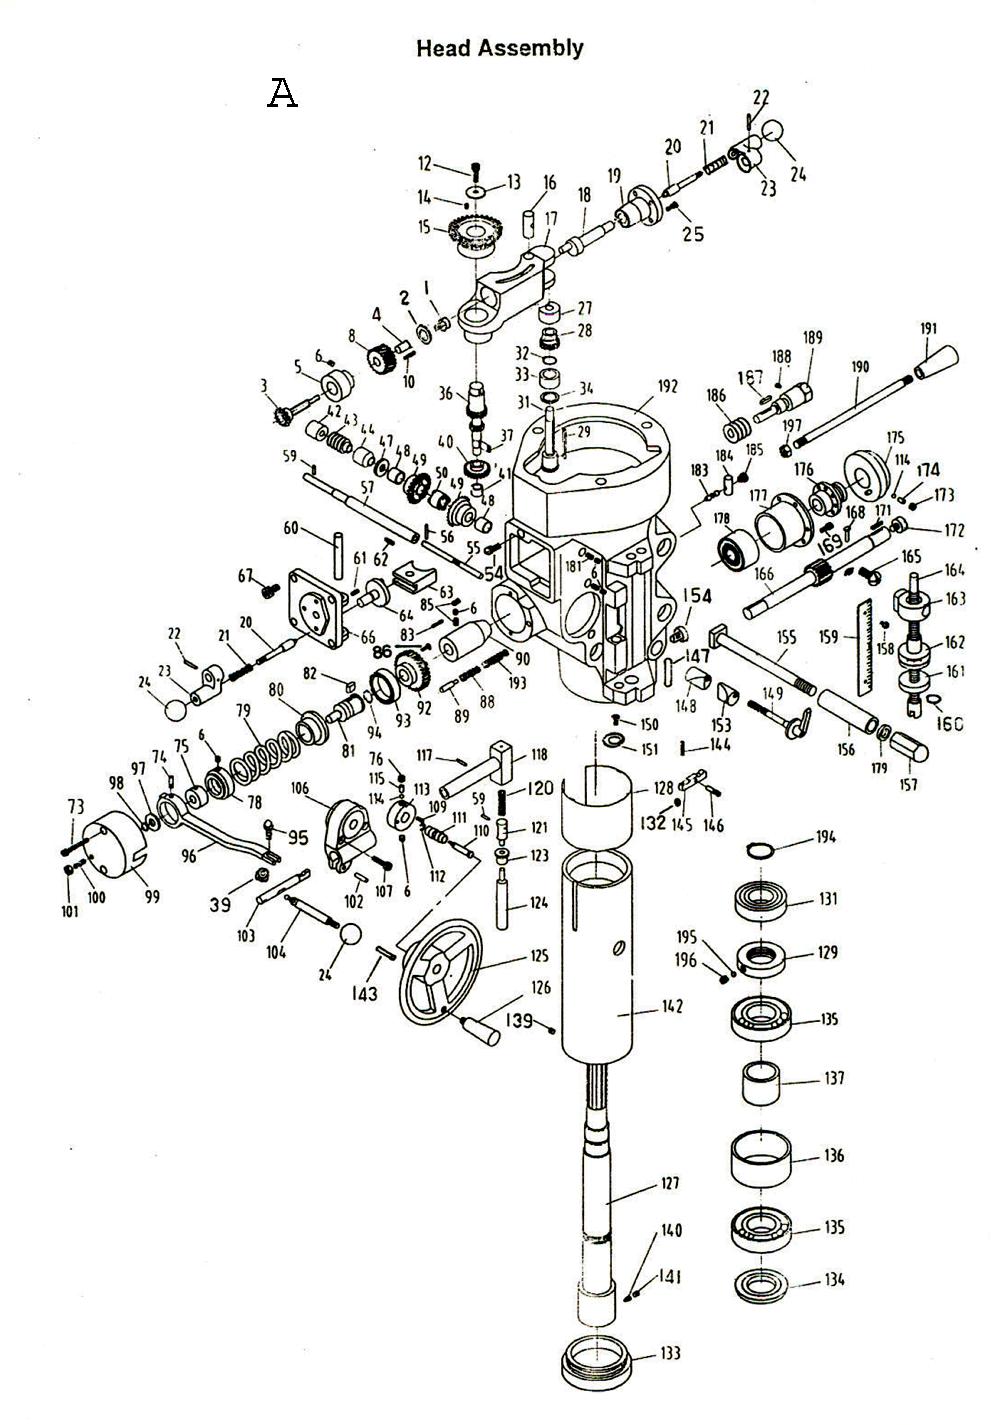 690120-jet-PB-1Break Down